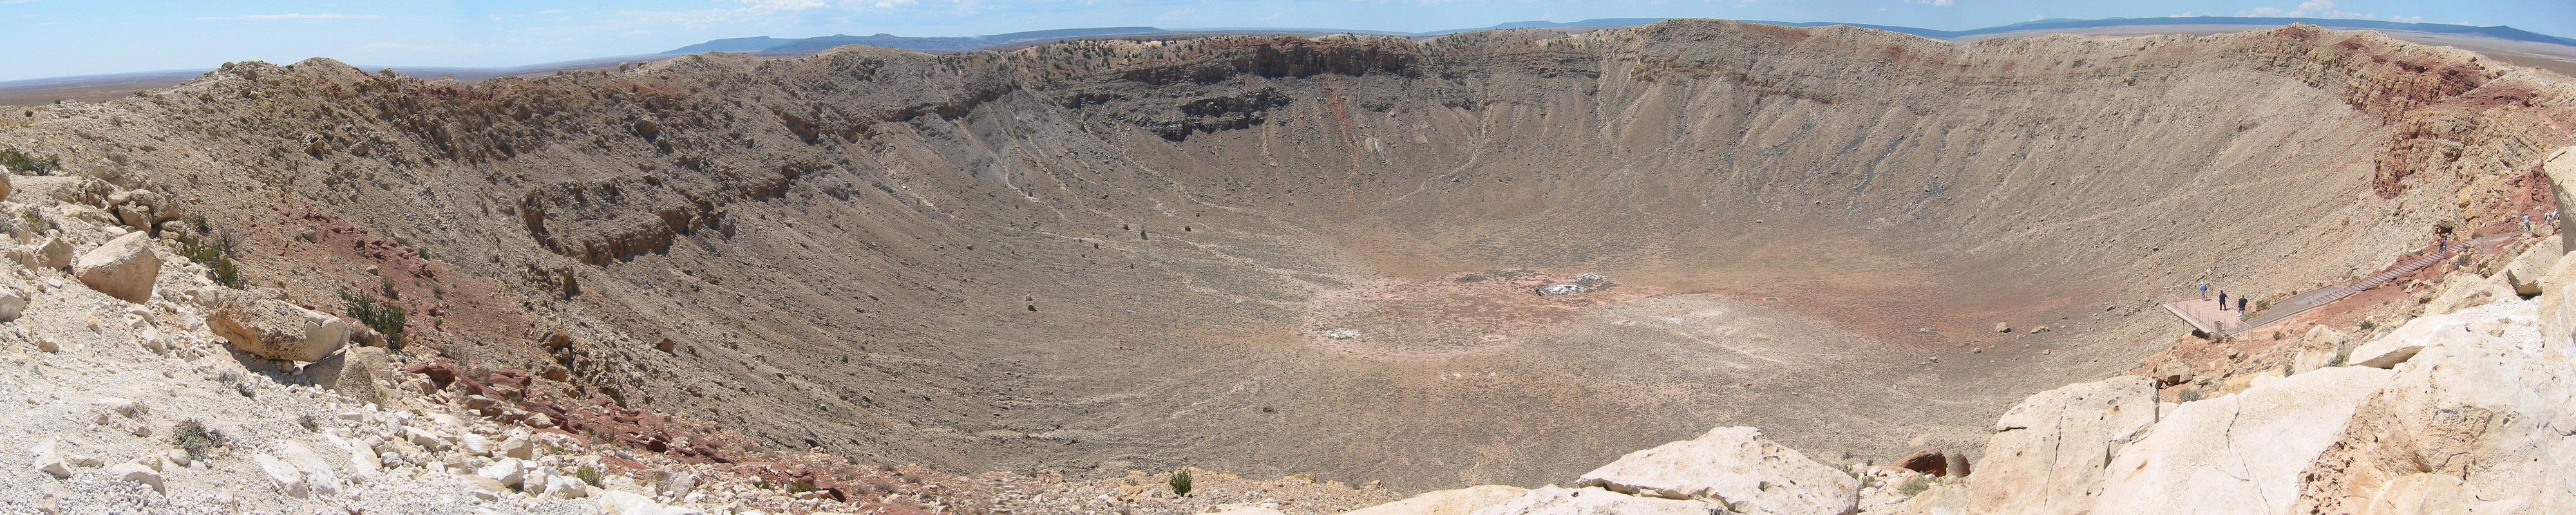 Impact_crater.jpg